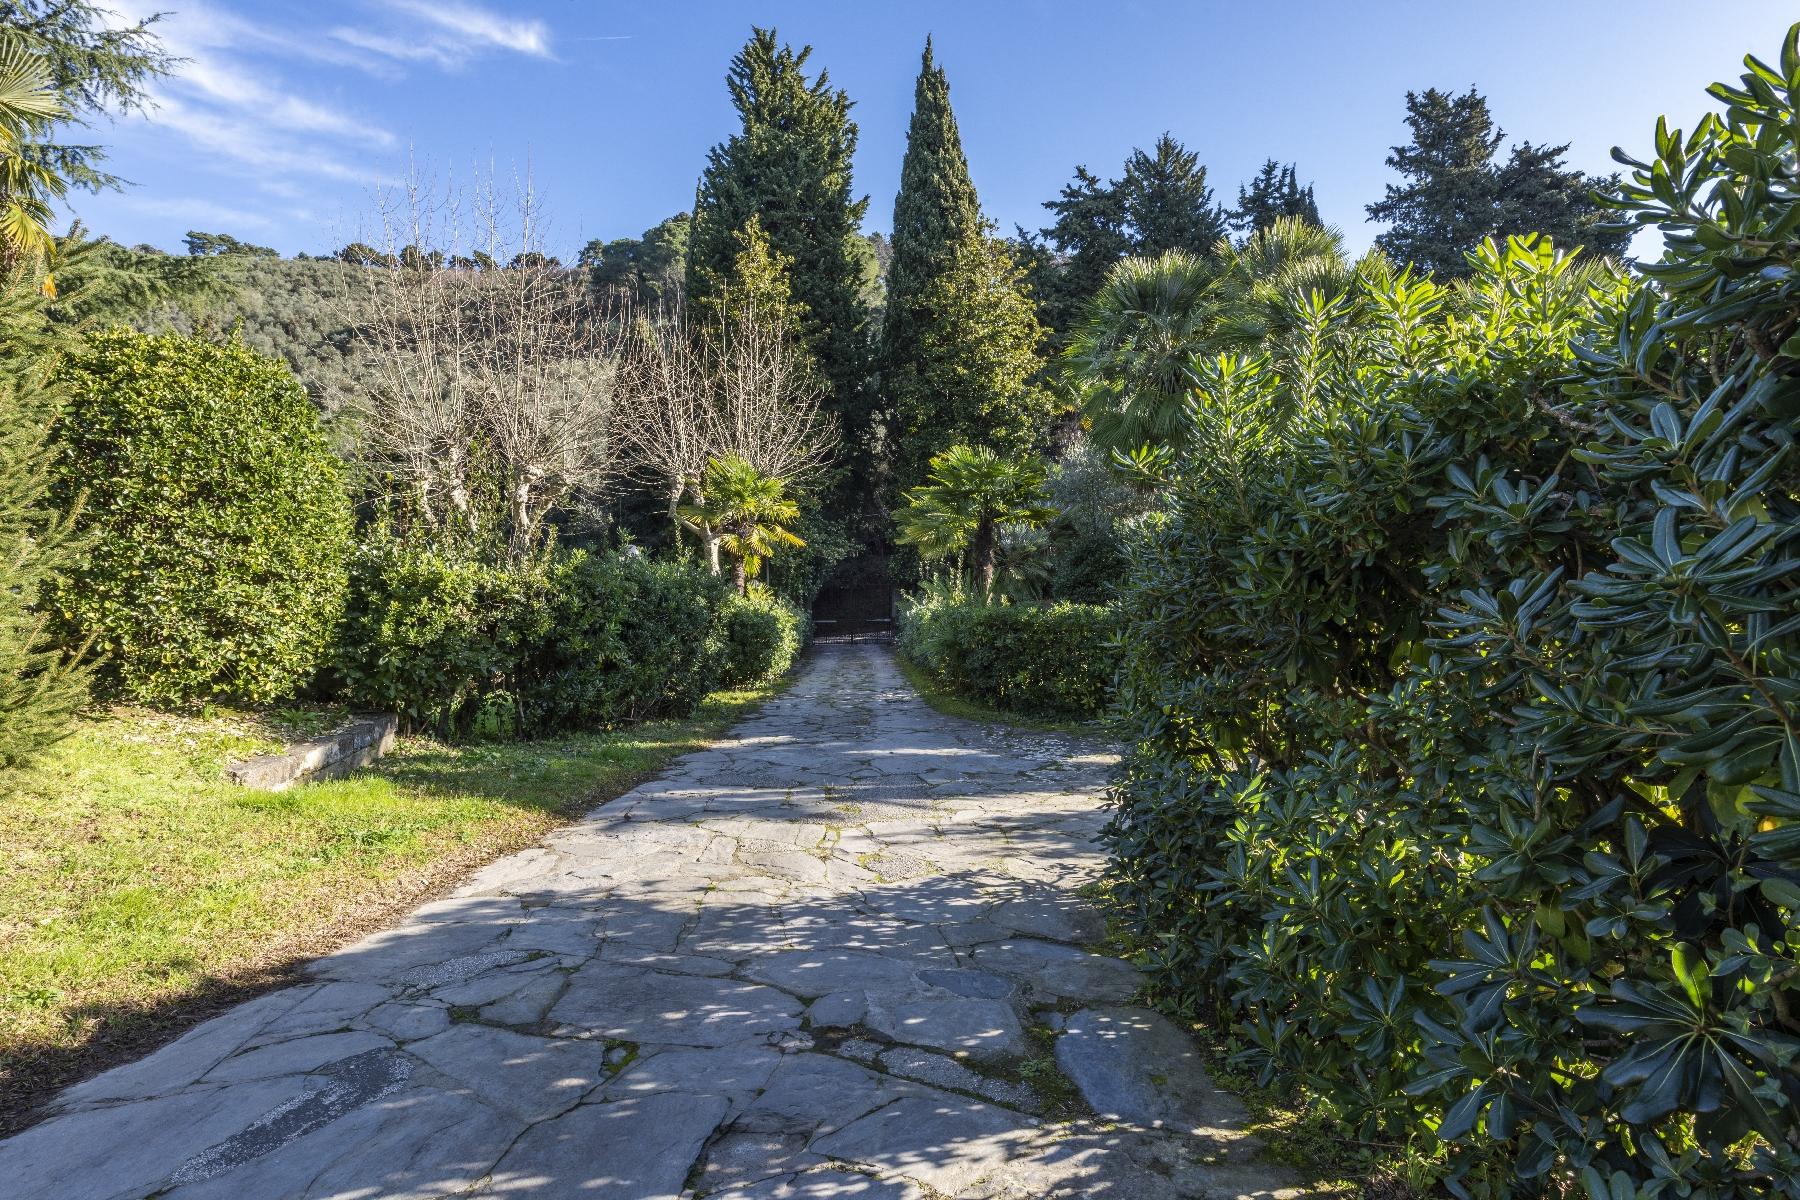 Villa in Vendita a Camaiore: 5 locali, 2800 mq - Foto 26